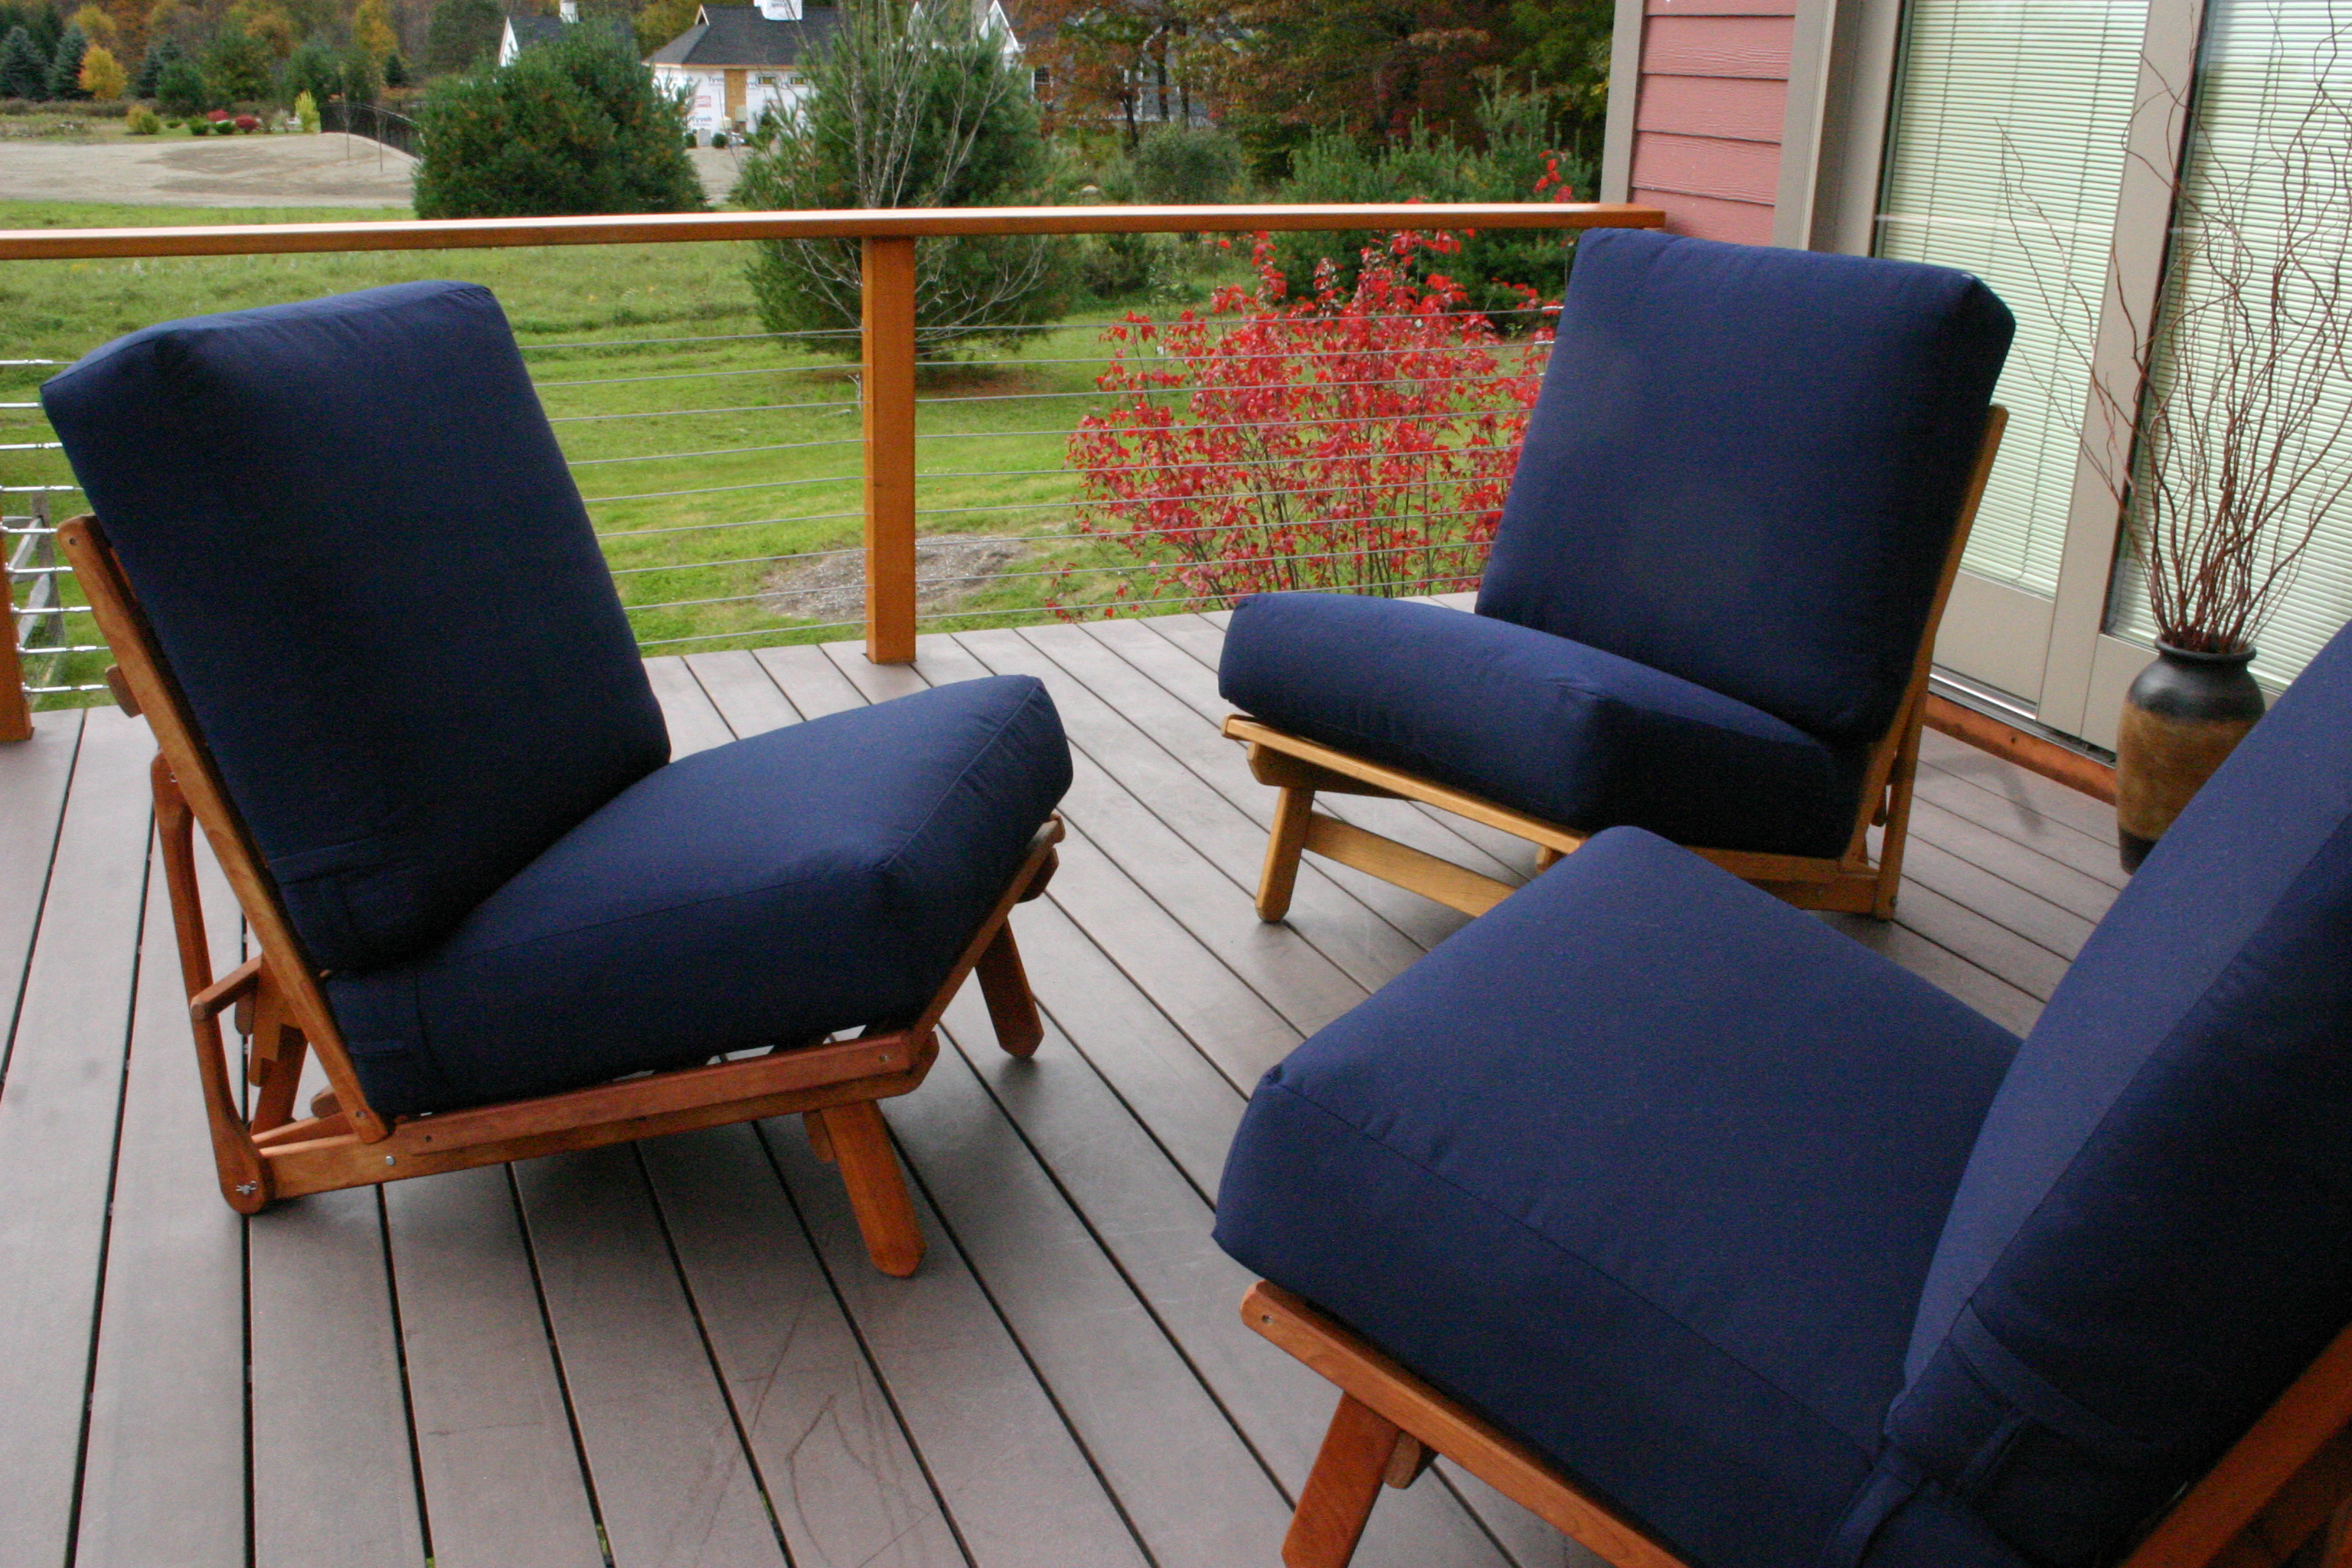 Three Freedom Chairs